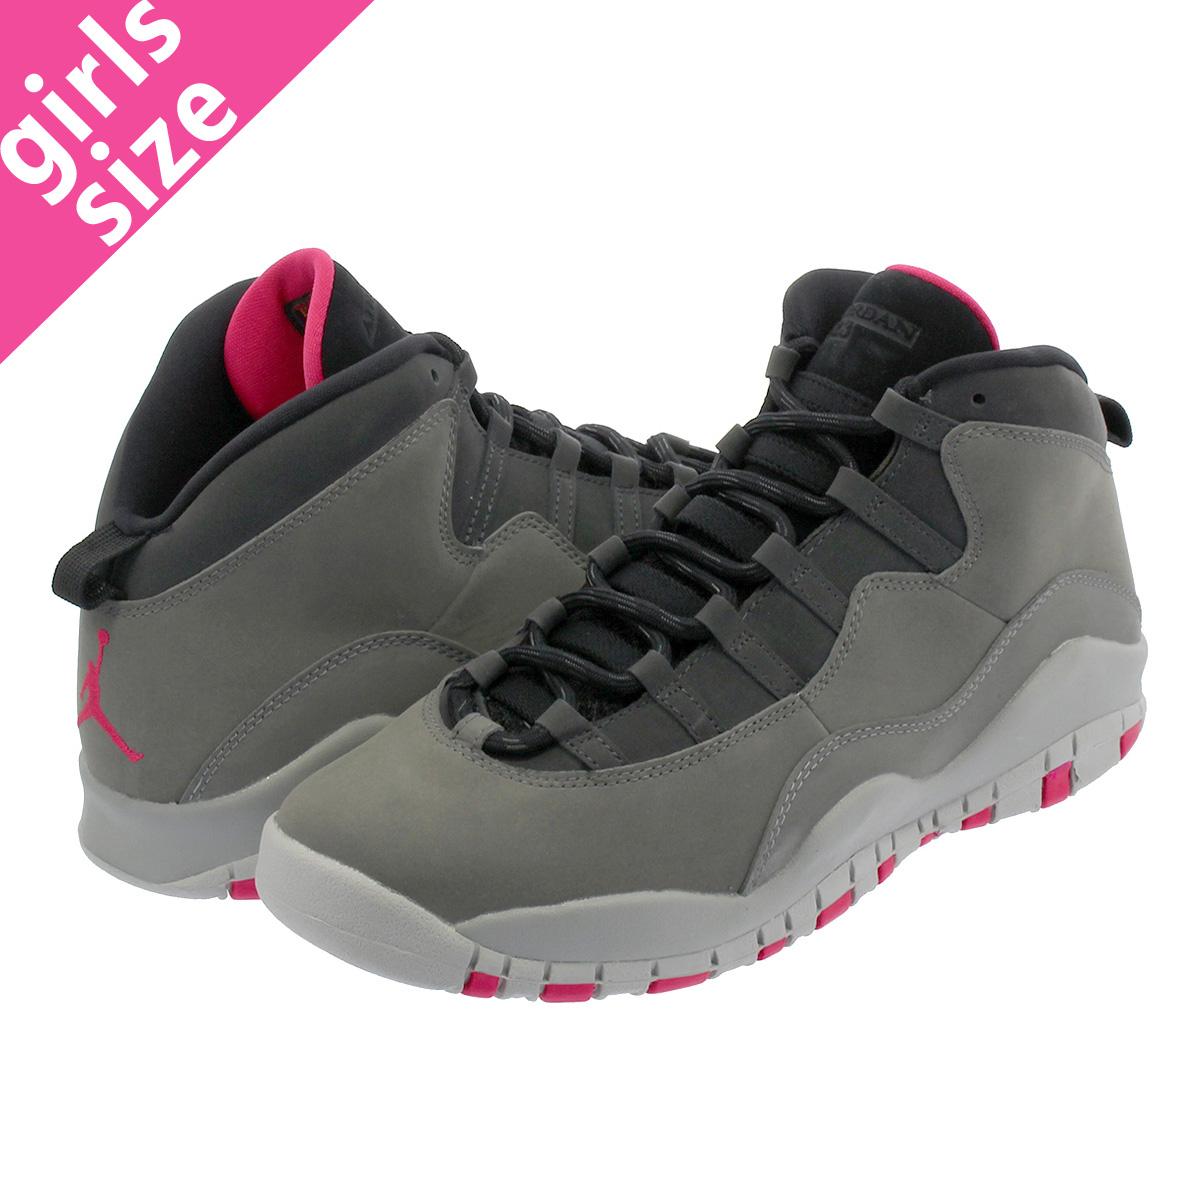 9ecddee42184 NIKE AIR JORDAN 10 RETRO GG Nike Air Jordan 10 nostalgic GG DARK SMOKE GREY RUSH  PINK BLACK IRON GREY 487